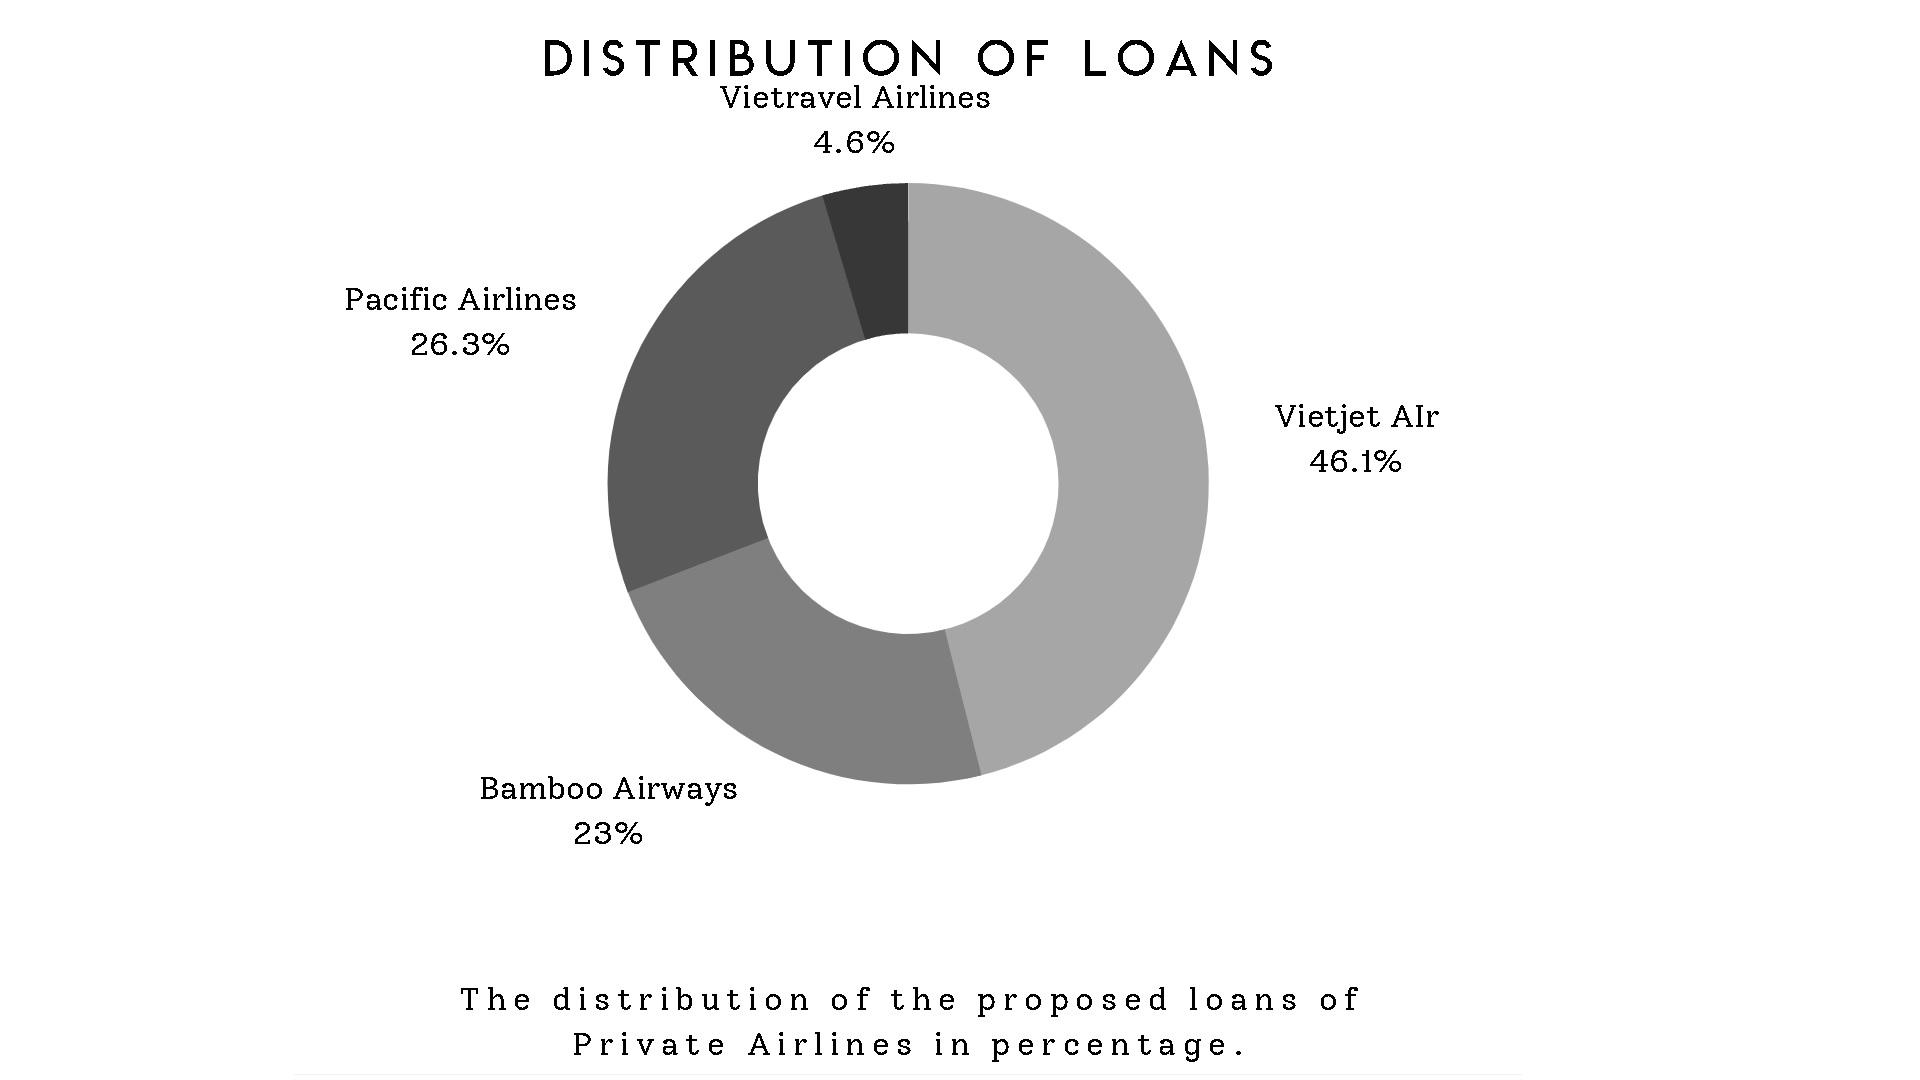 to visualize distribution